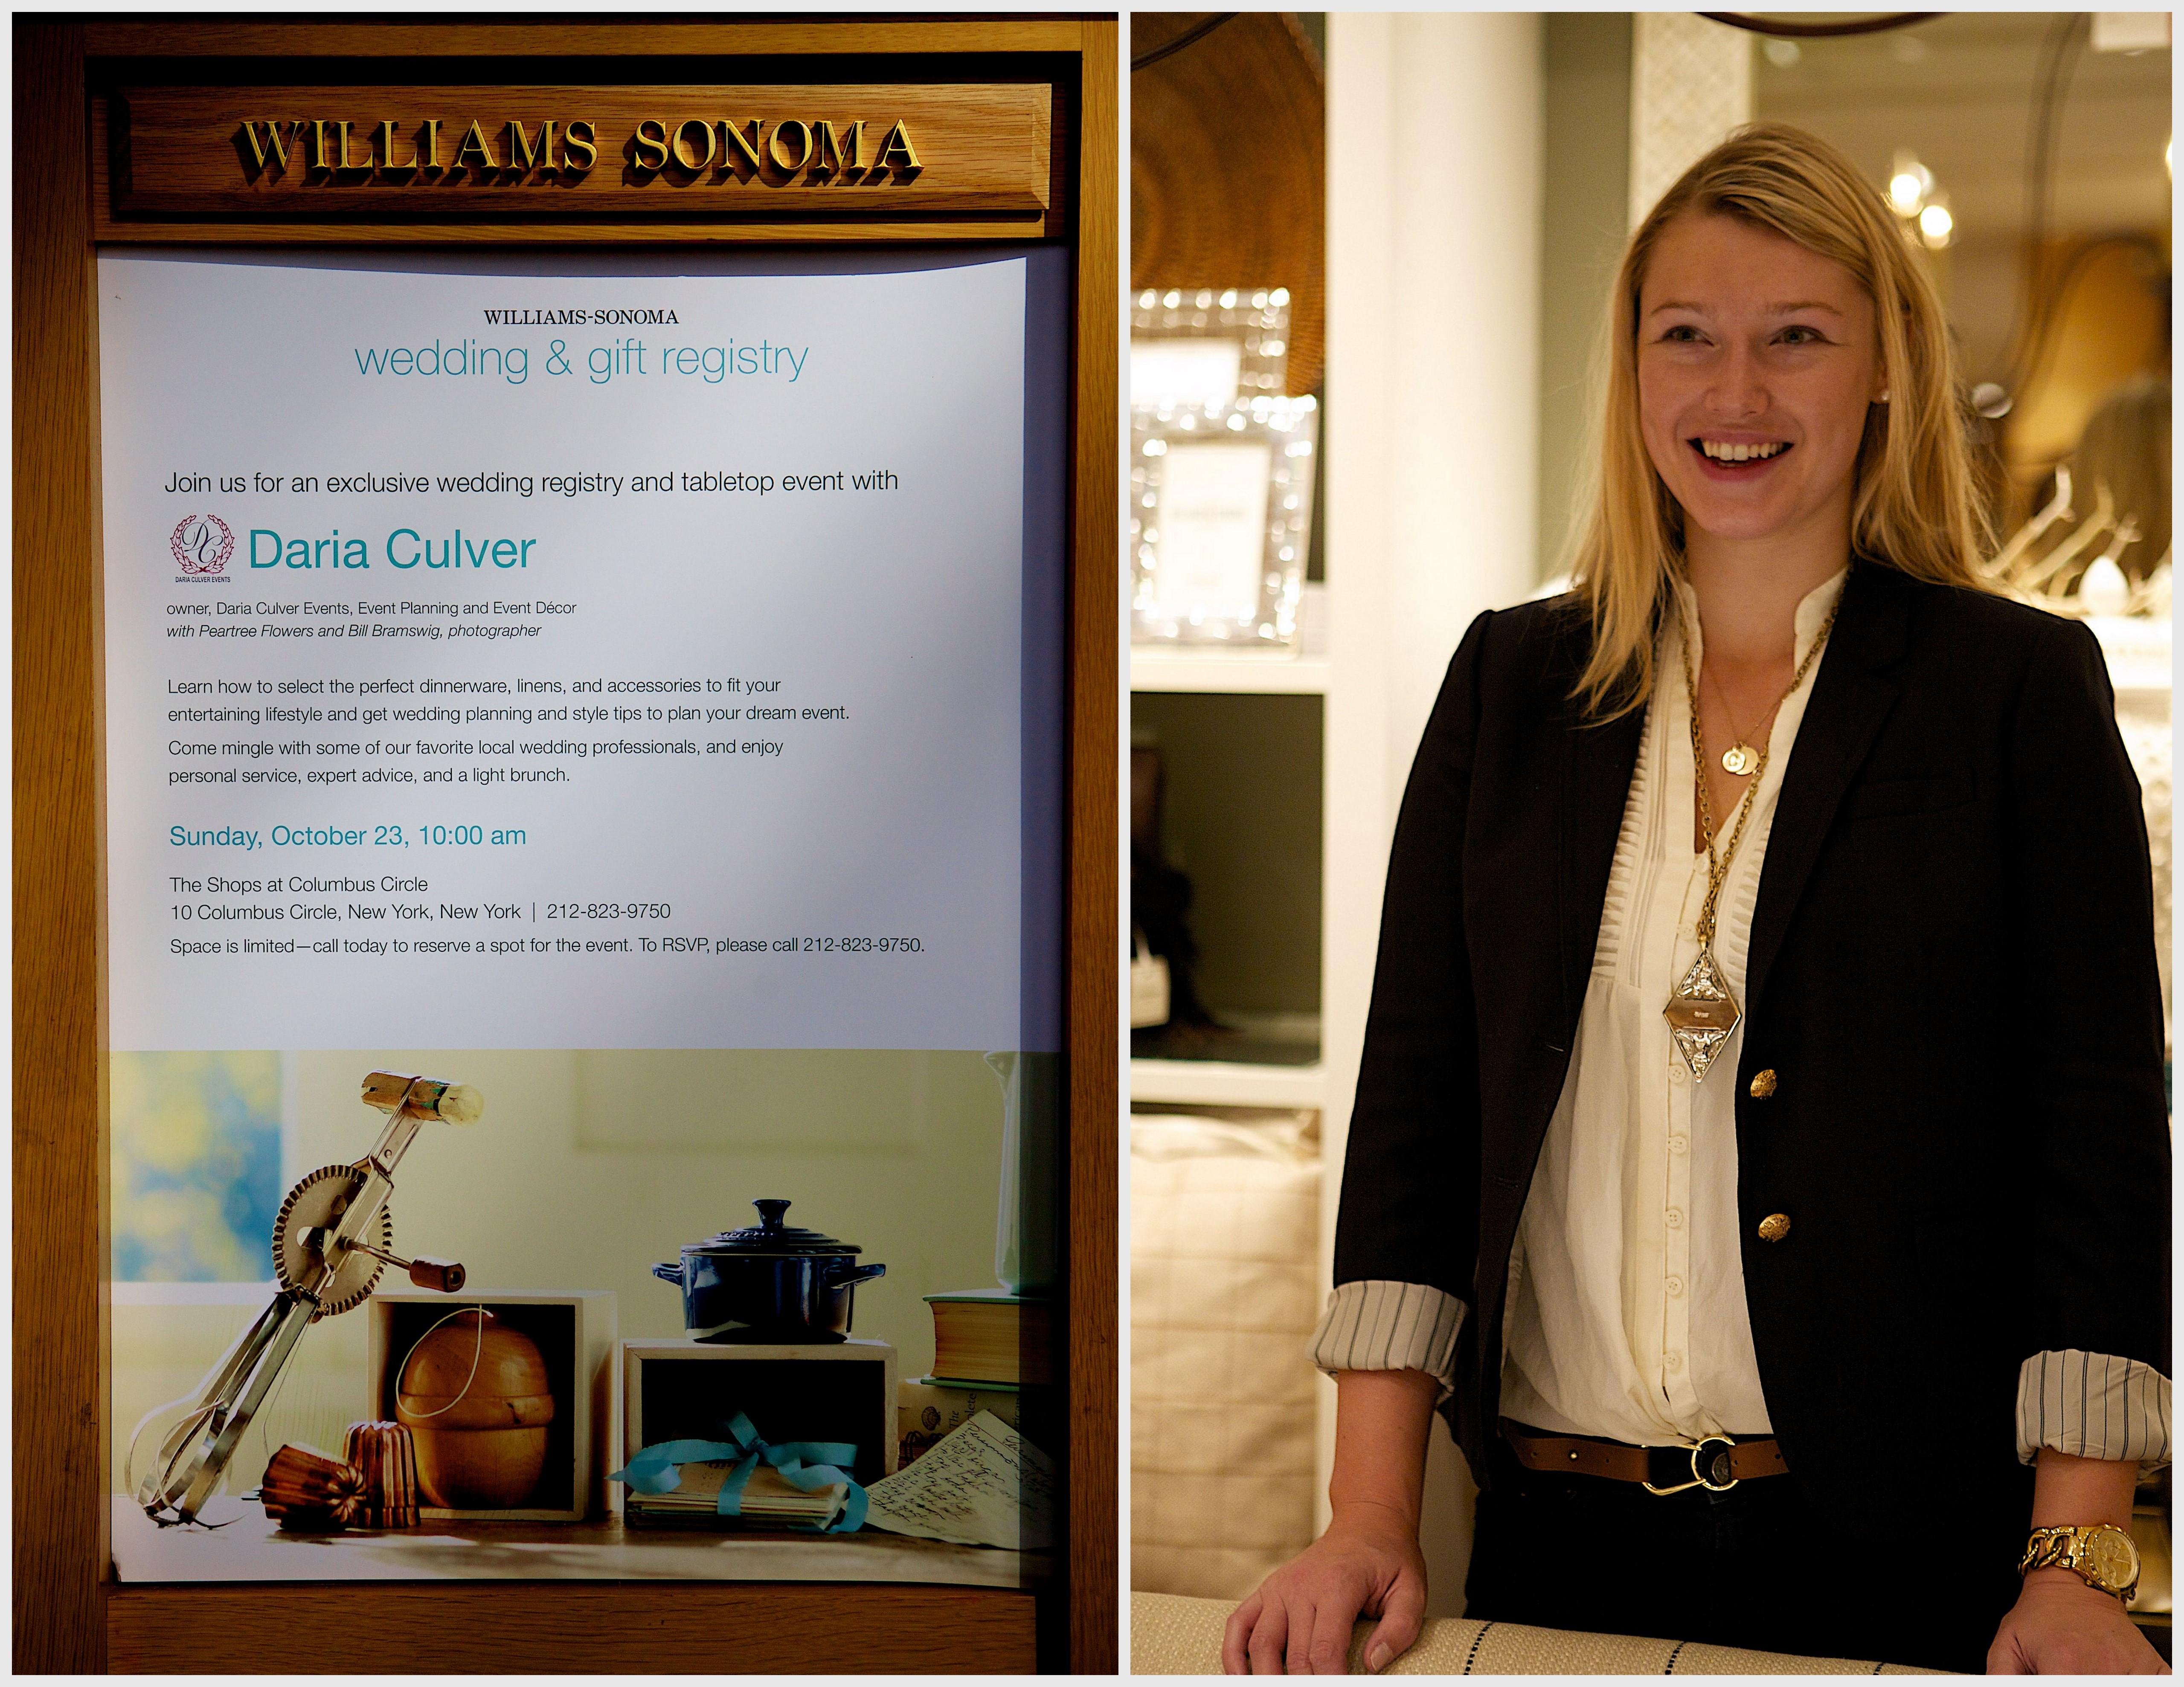 Williams Sonoma Wedding Registry.Williams Sonoma Bridal And Registry Event Daria Culver Events